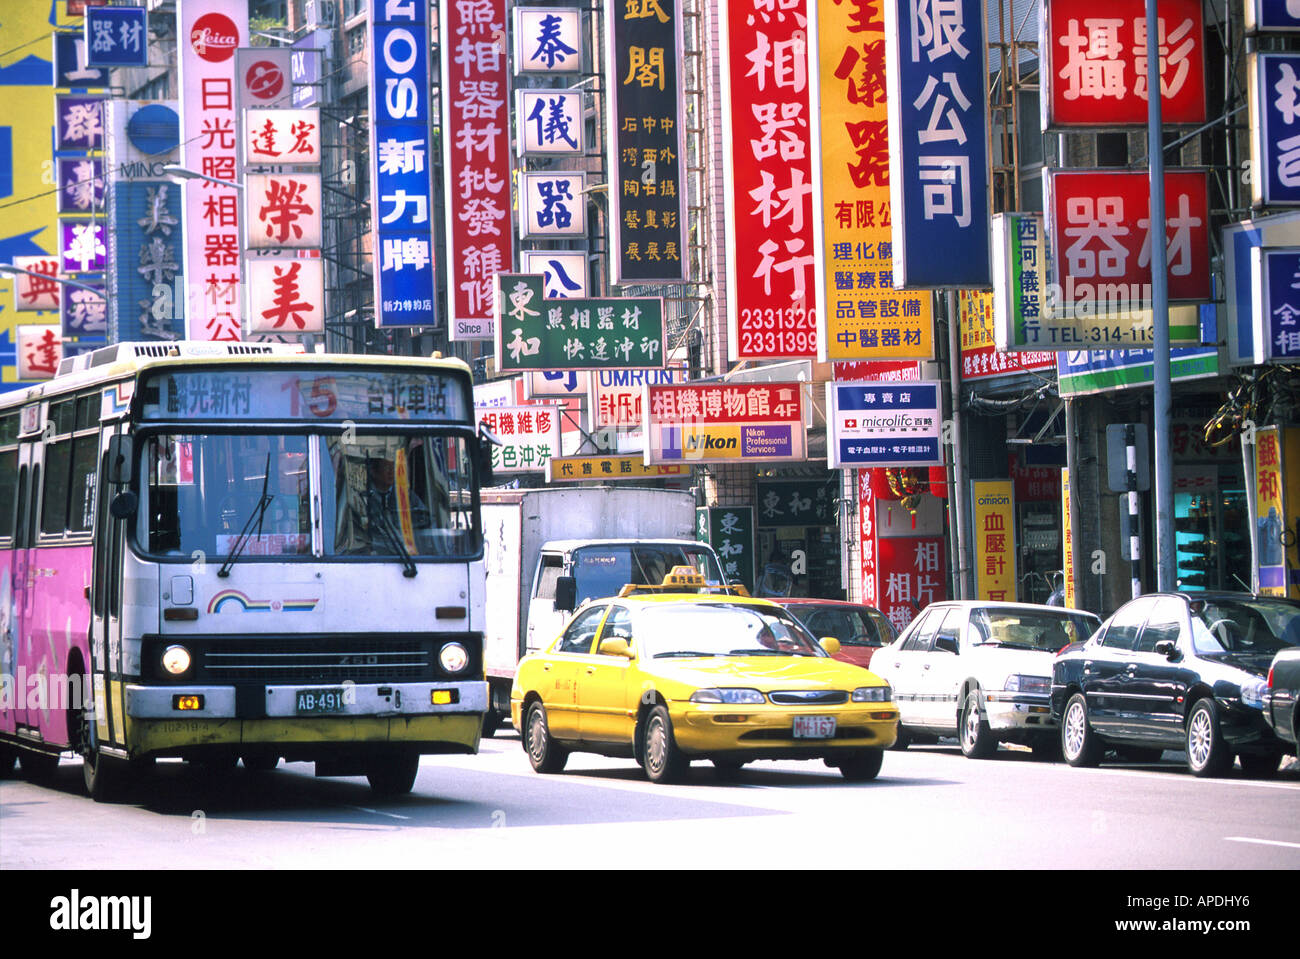 Leuchtreklame, Chungchiung Road, Zentrum, Taipeh Taiwan R.O.C. - Stock Image